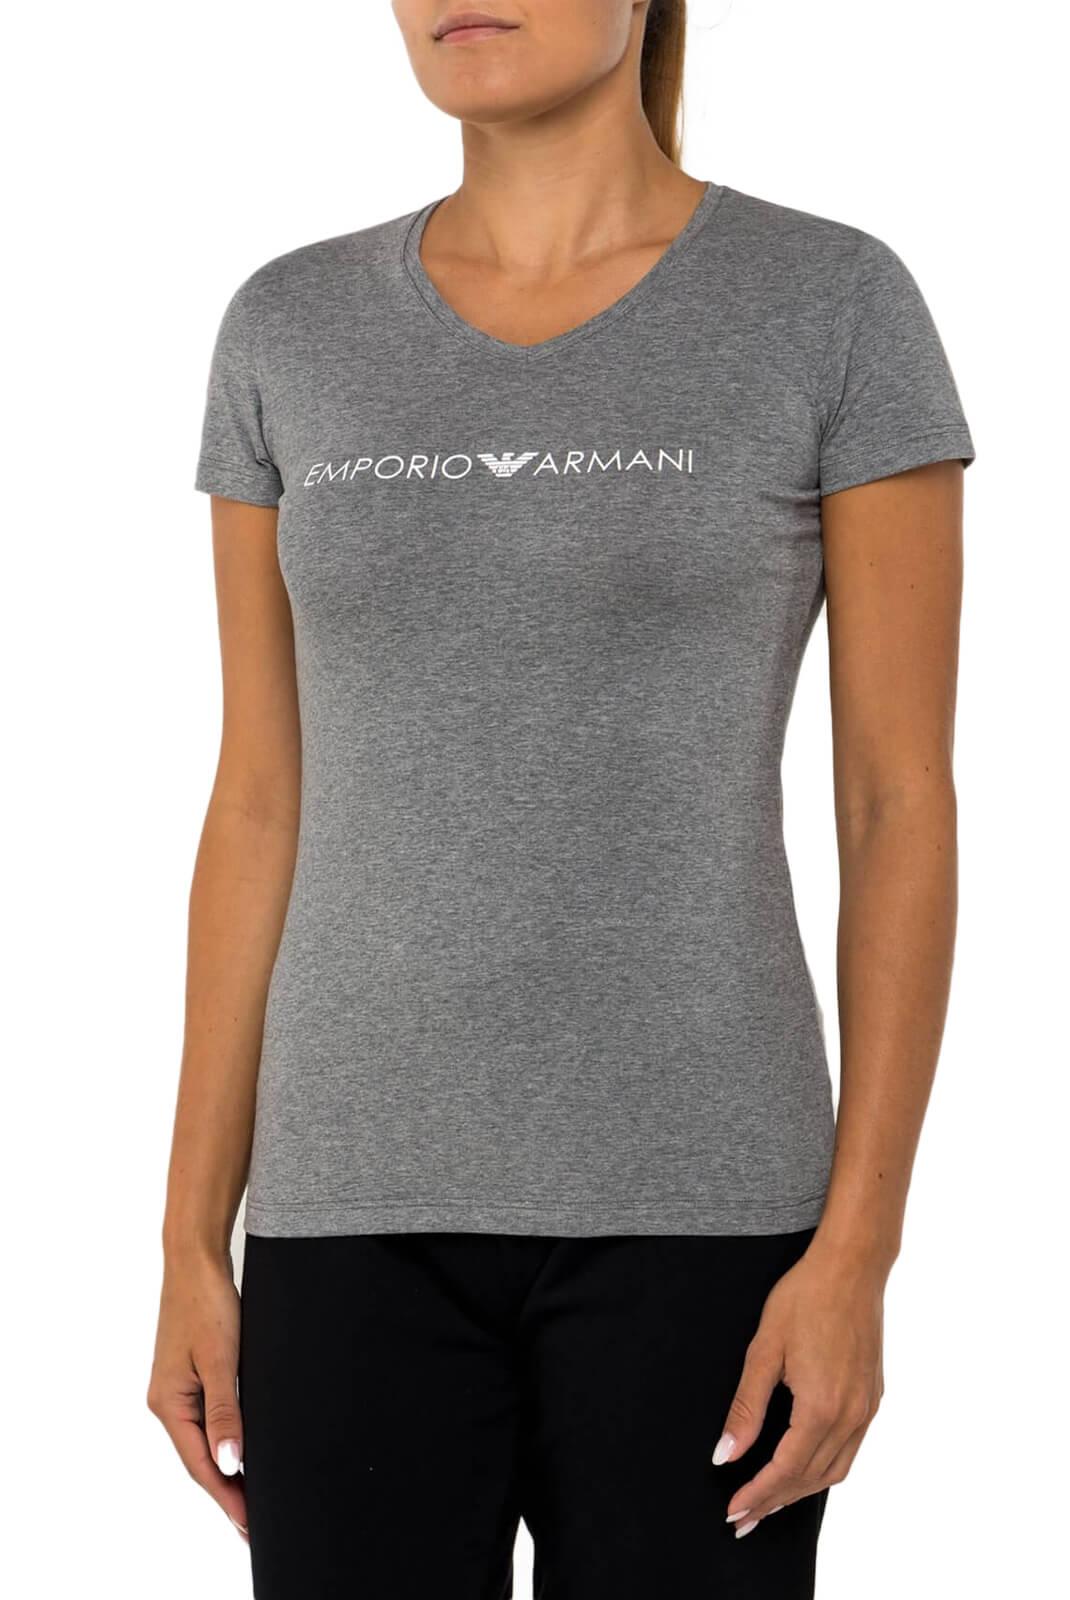 Tops & Tee shirts  Emporio armani 163321 9A317 6749 GRIS